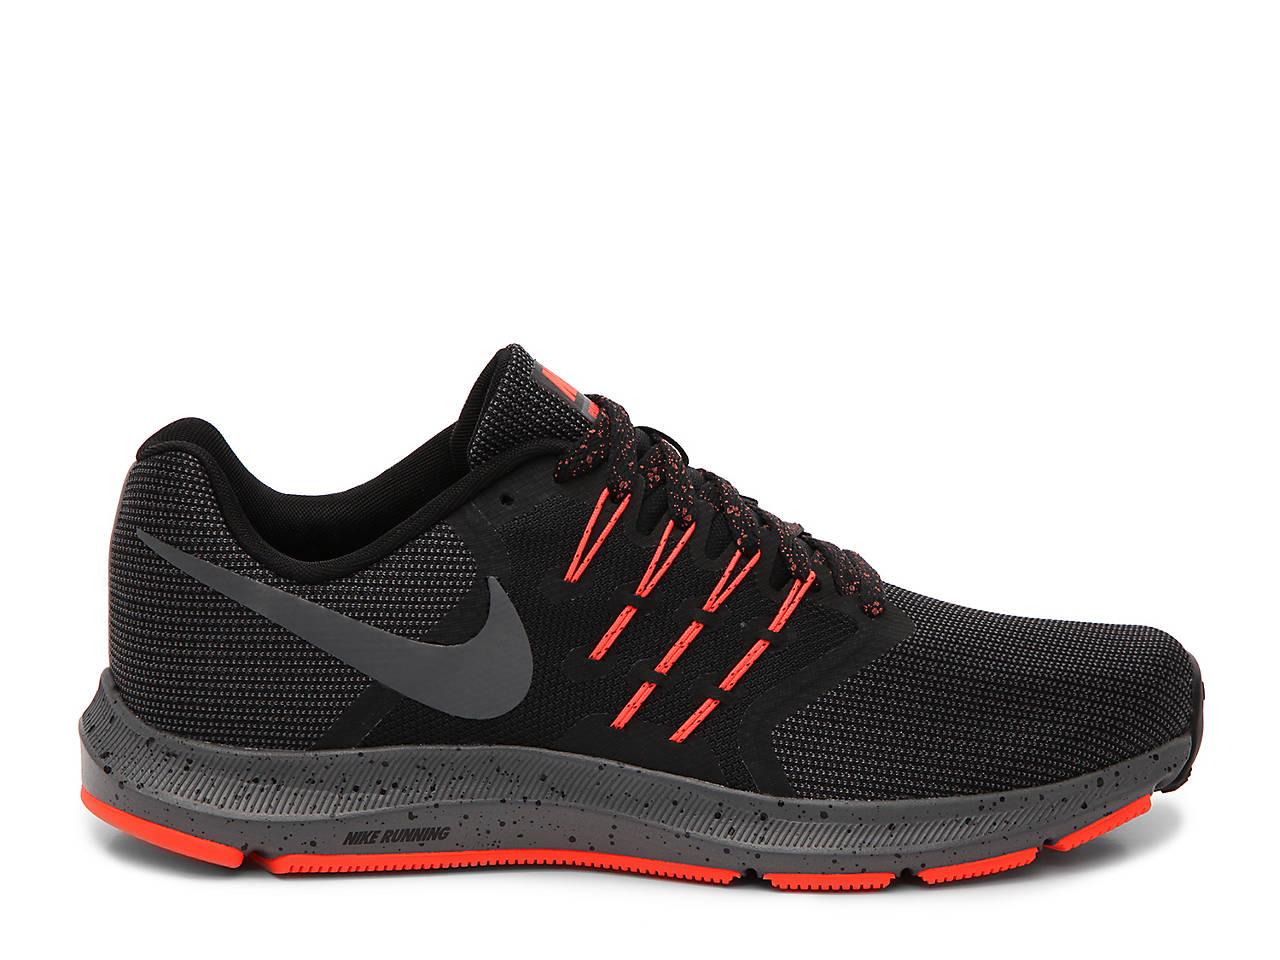 1d52bad7f5ef64 Nike Run Swift Lightweight Running Shoe - Men's Men's Shoes | DSW